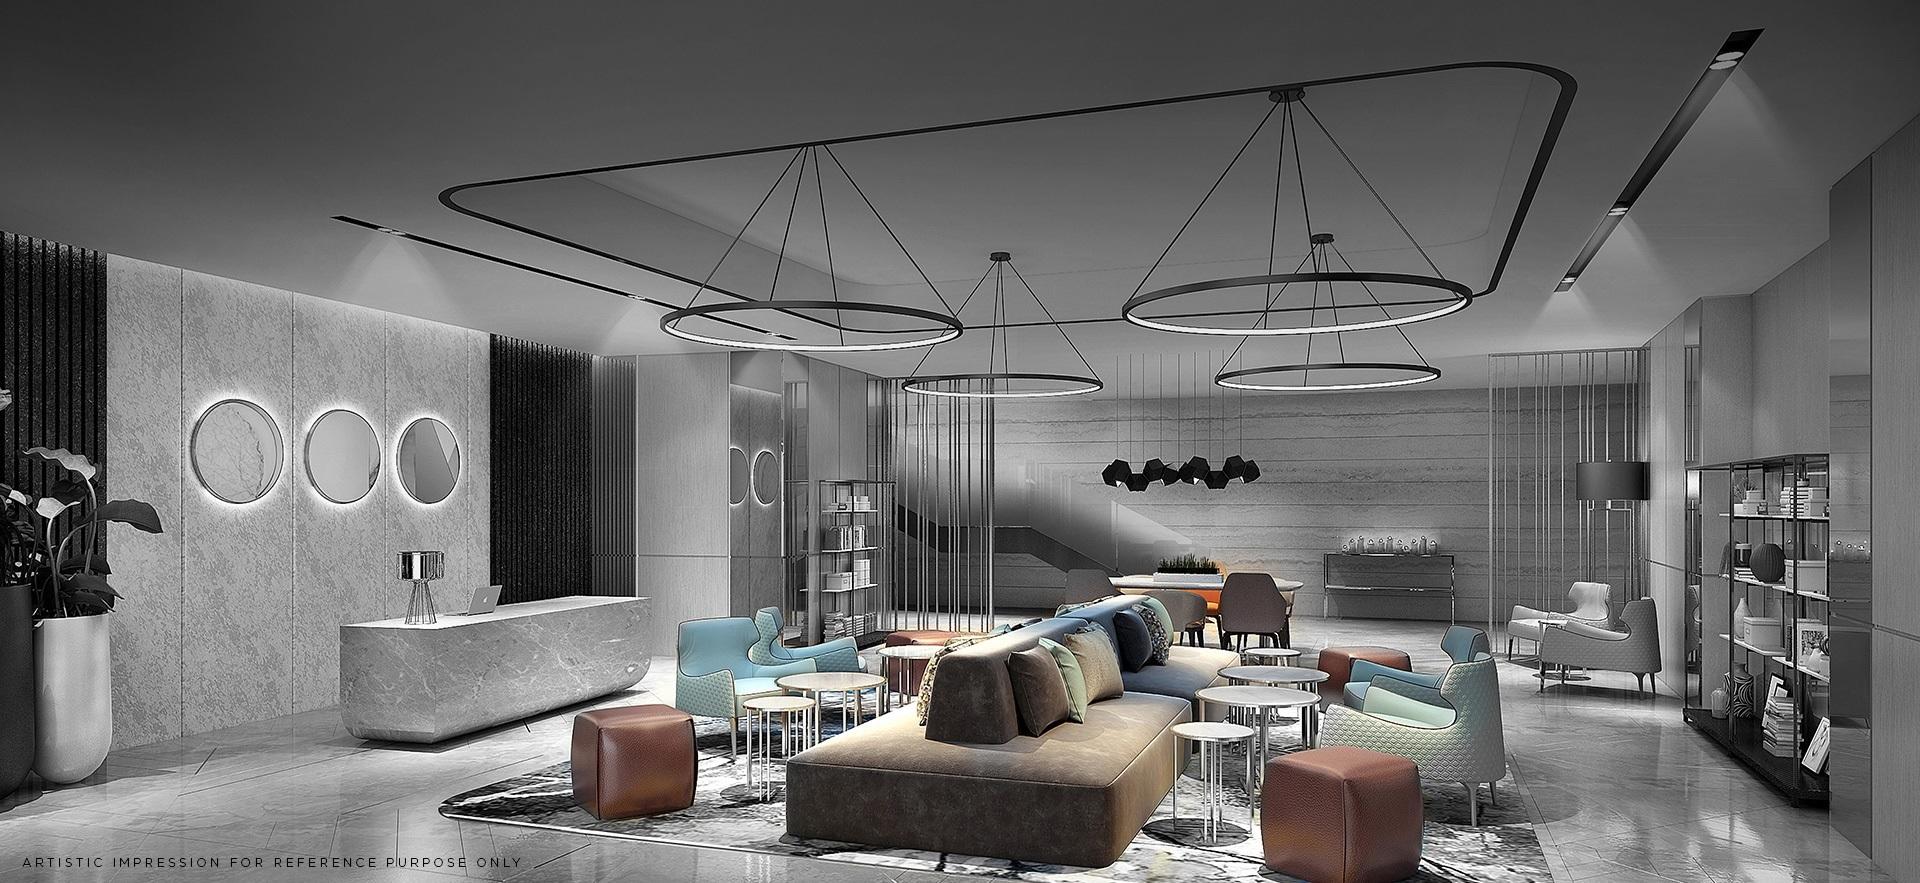 radius one mahalaxmi phase 2 project apartment interiors2